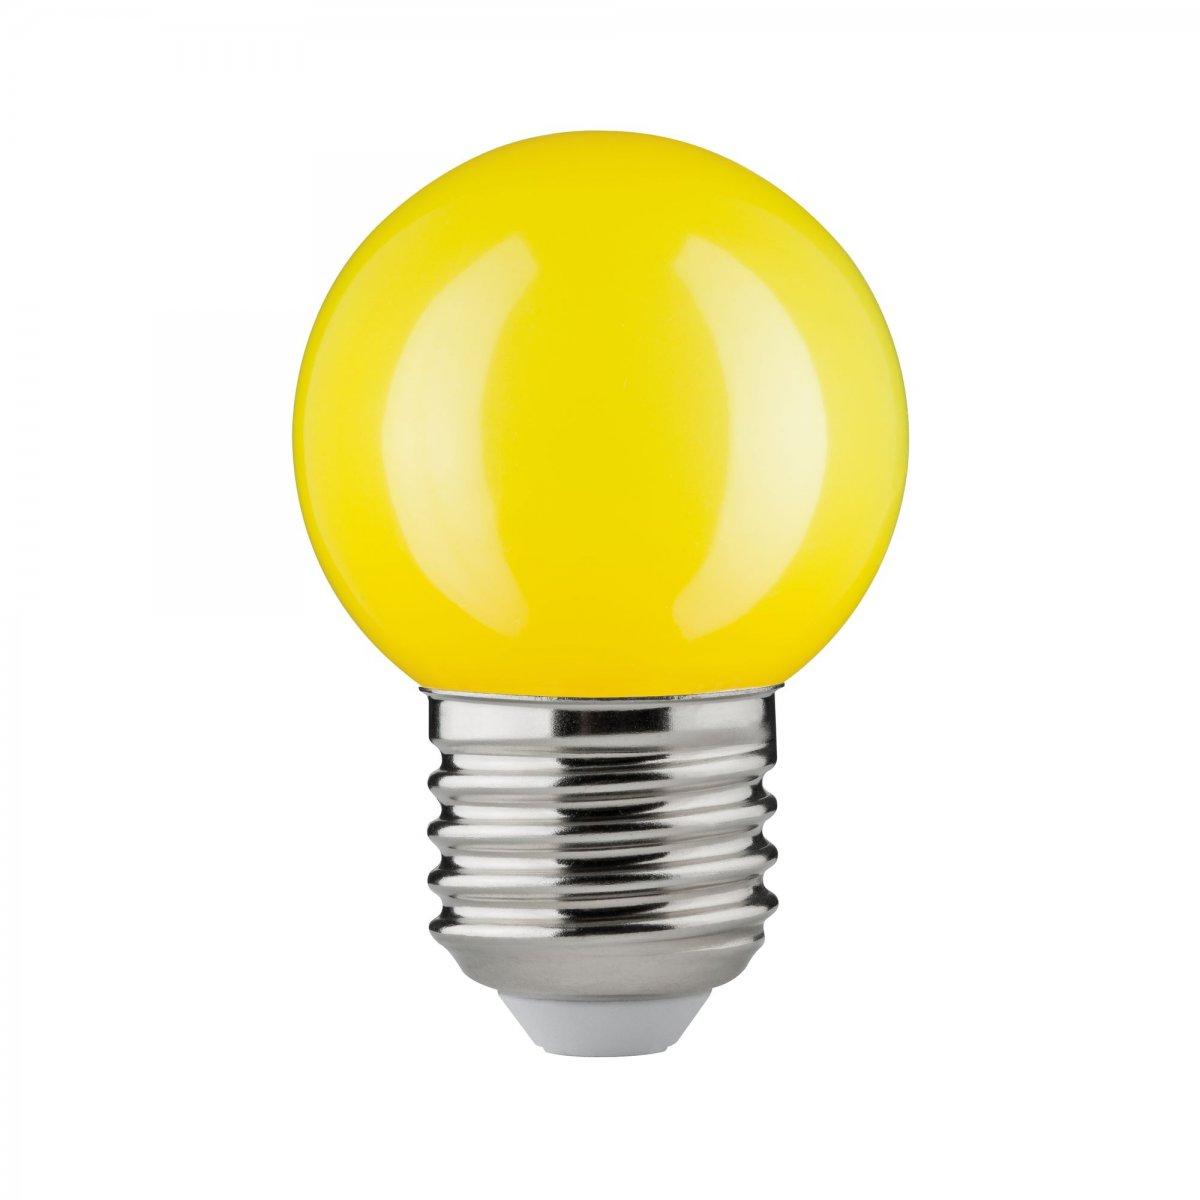 Paulmann No. 28529 LED Tropfen 2 Watt E27 Gelb schlagfest, EUR 3,36 ...